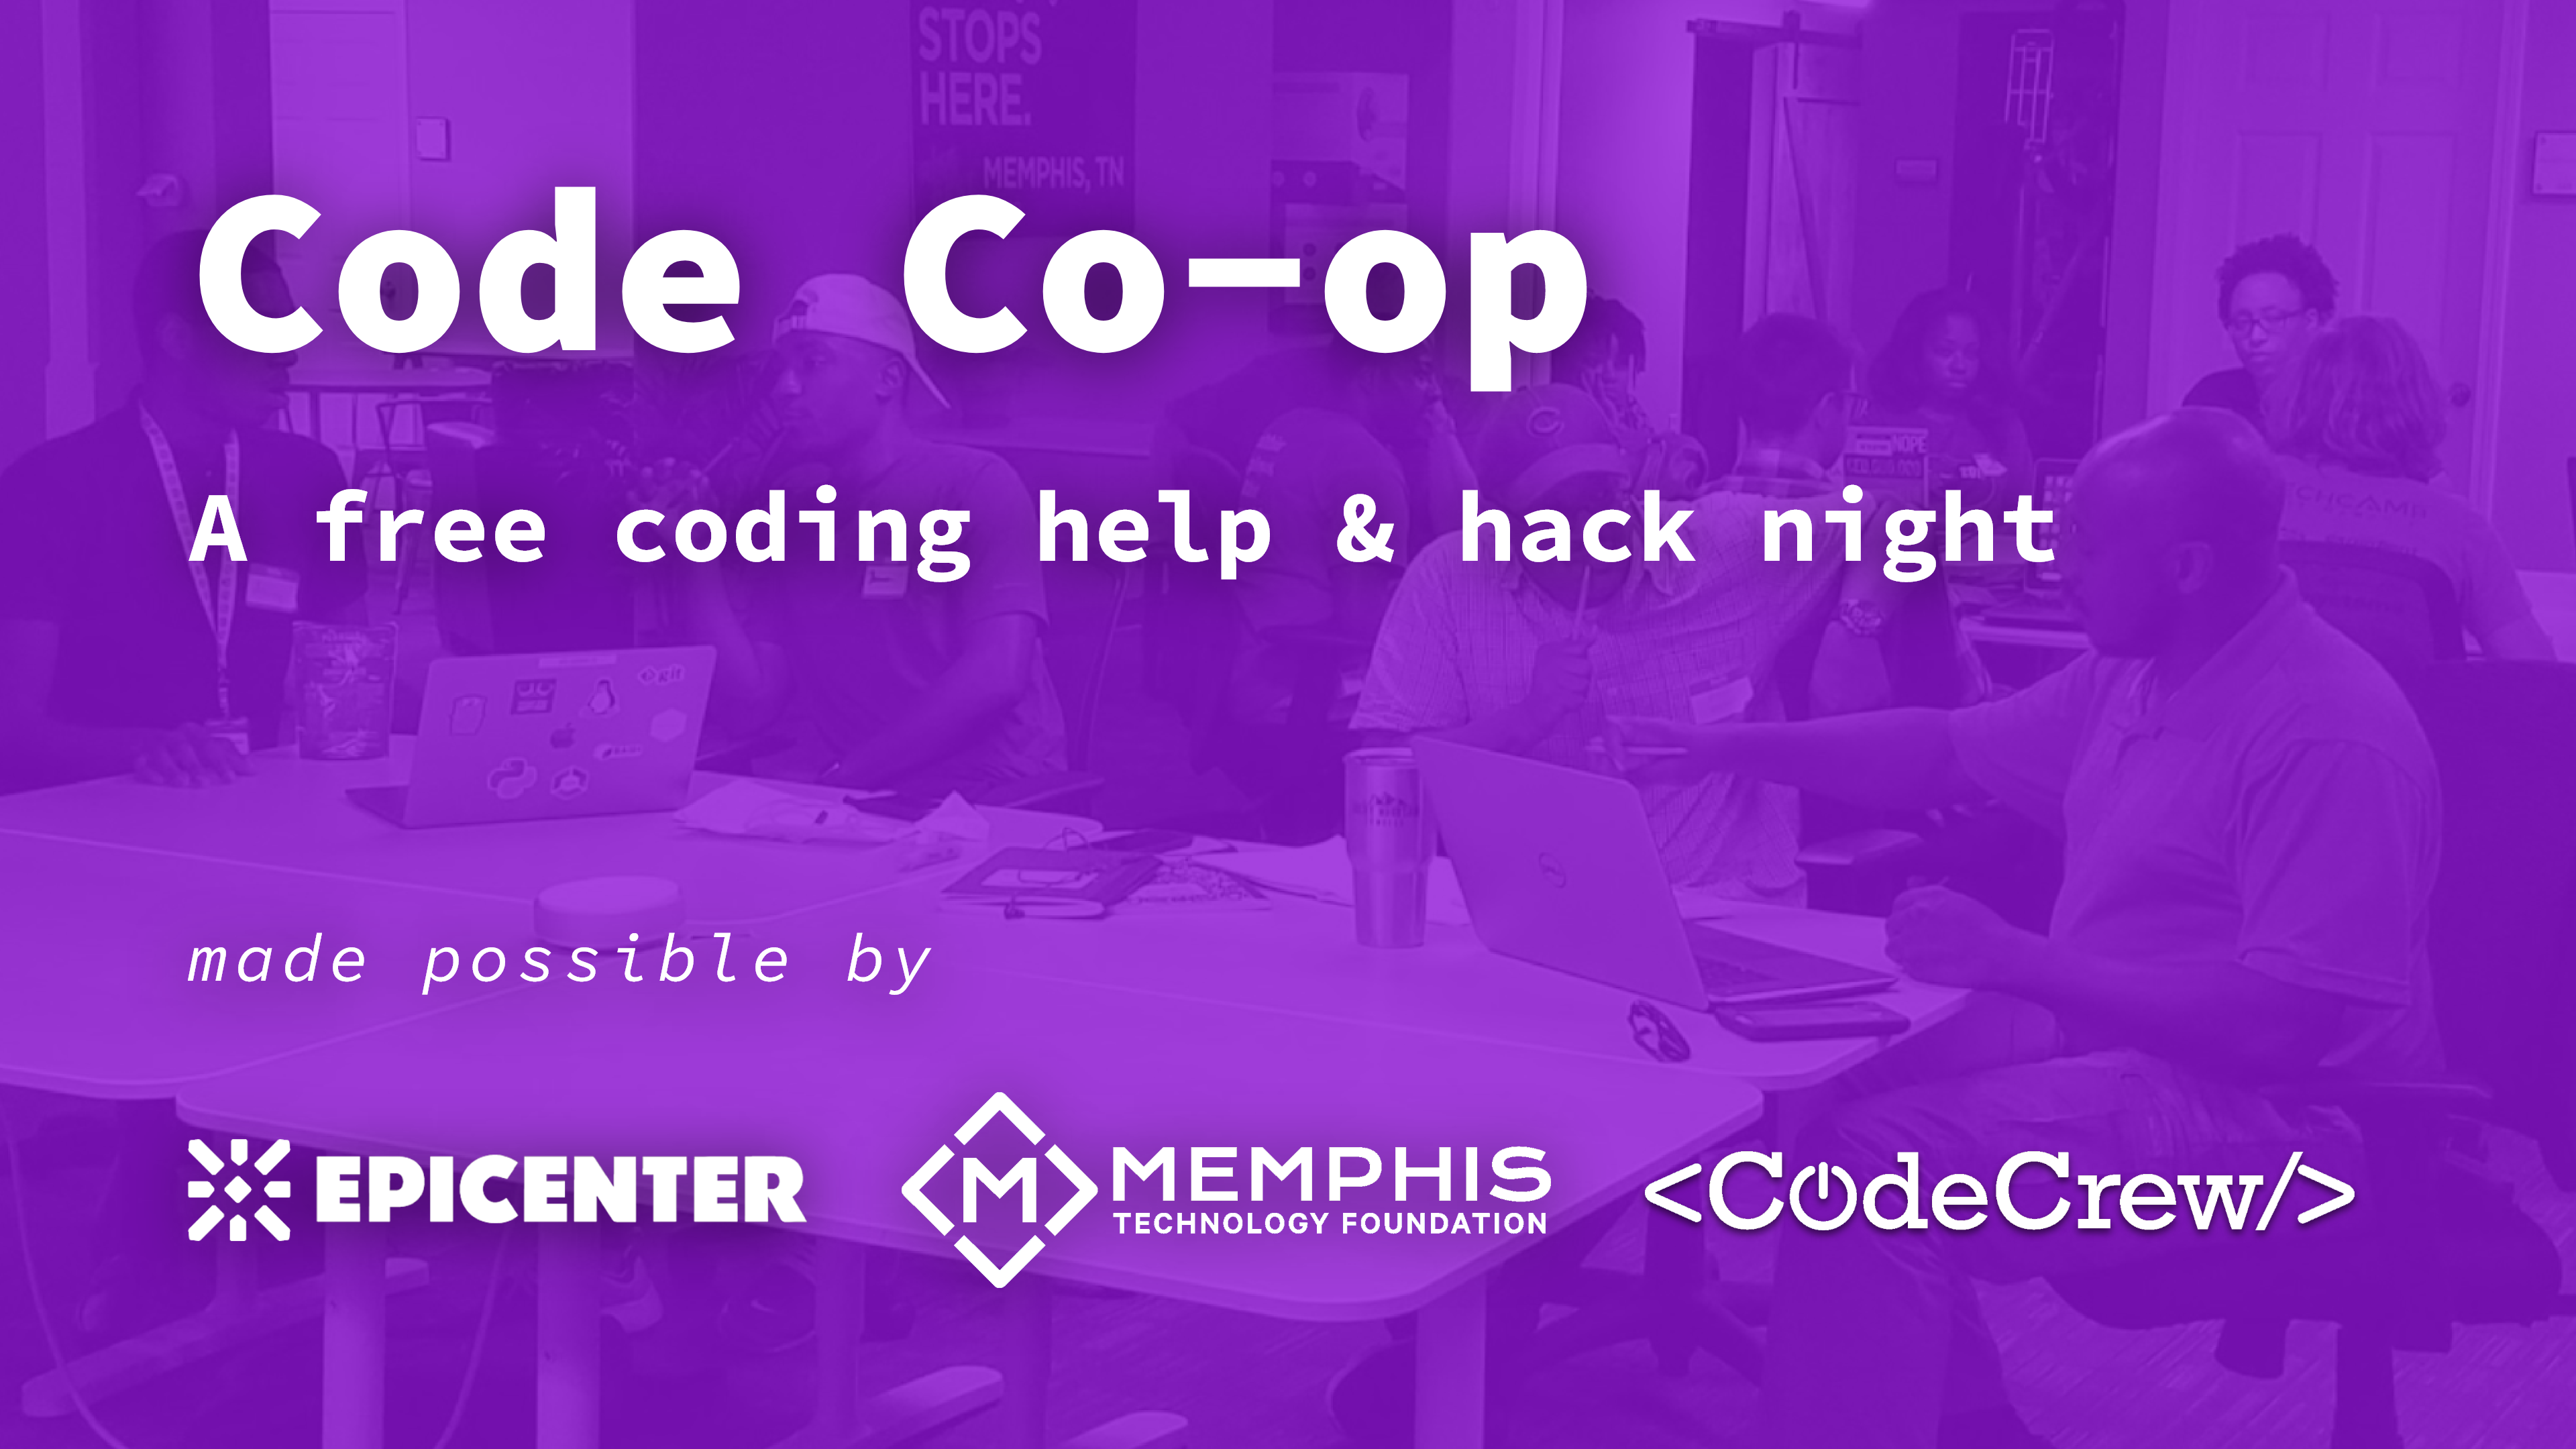 Code Co-op | Memphis - A free coding help & hack night